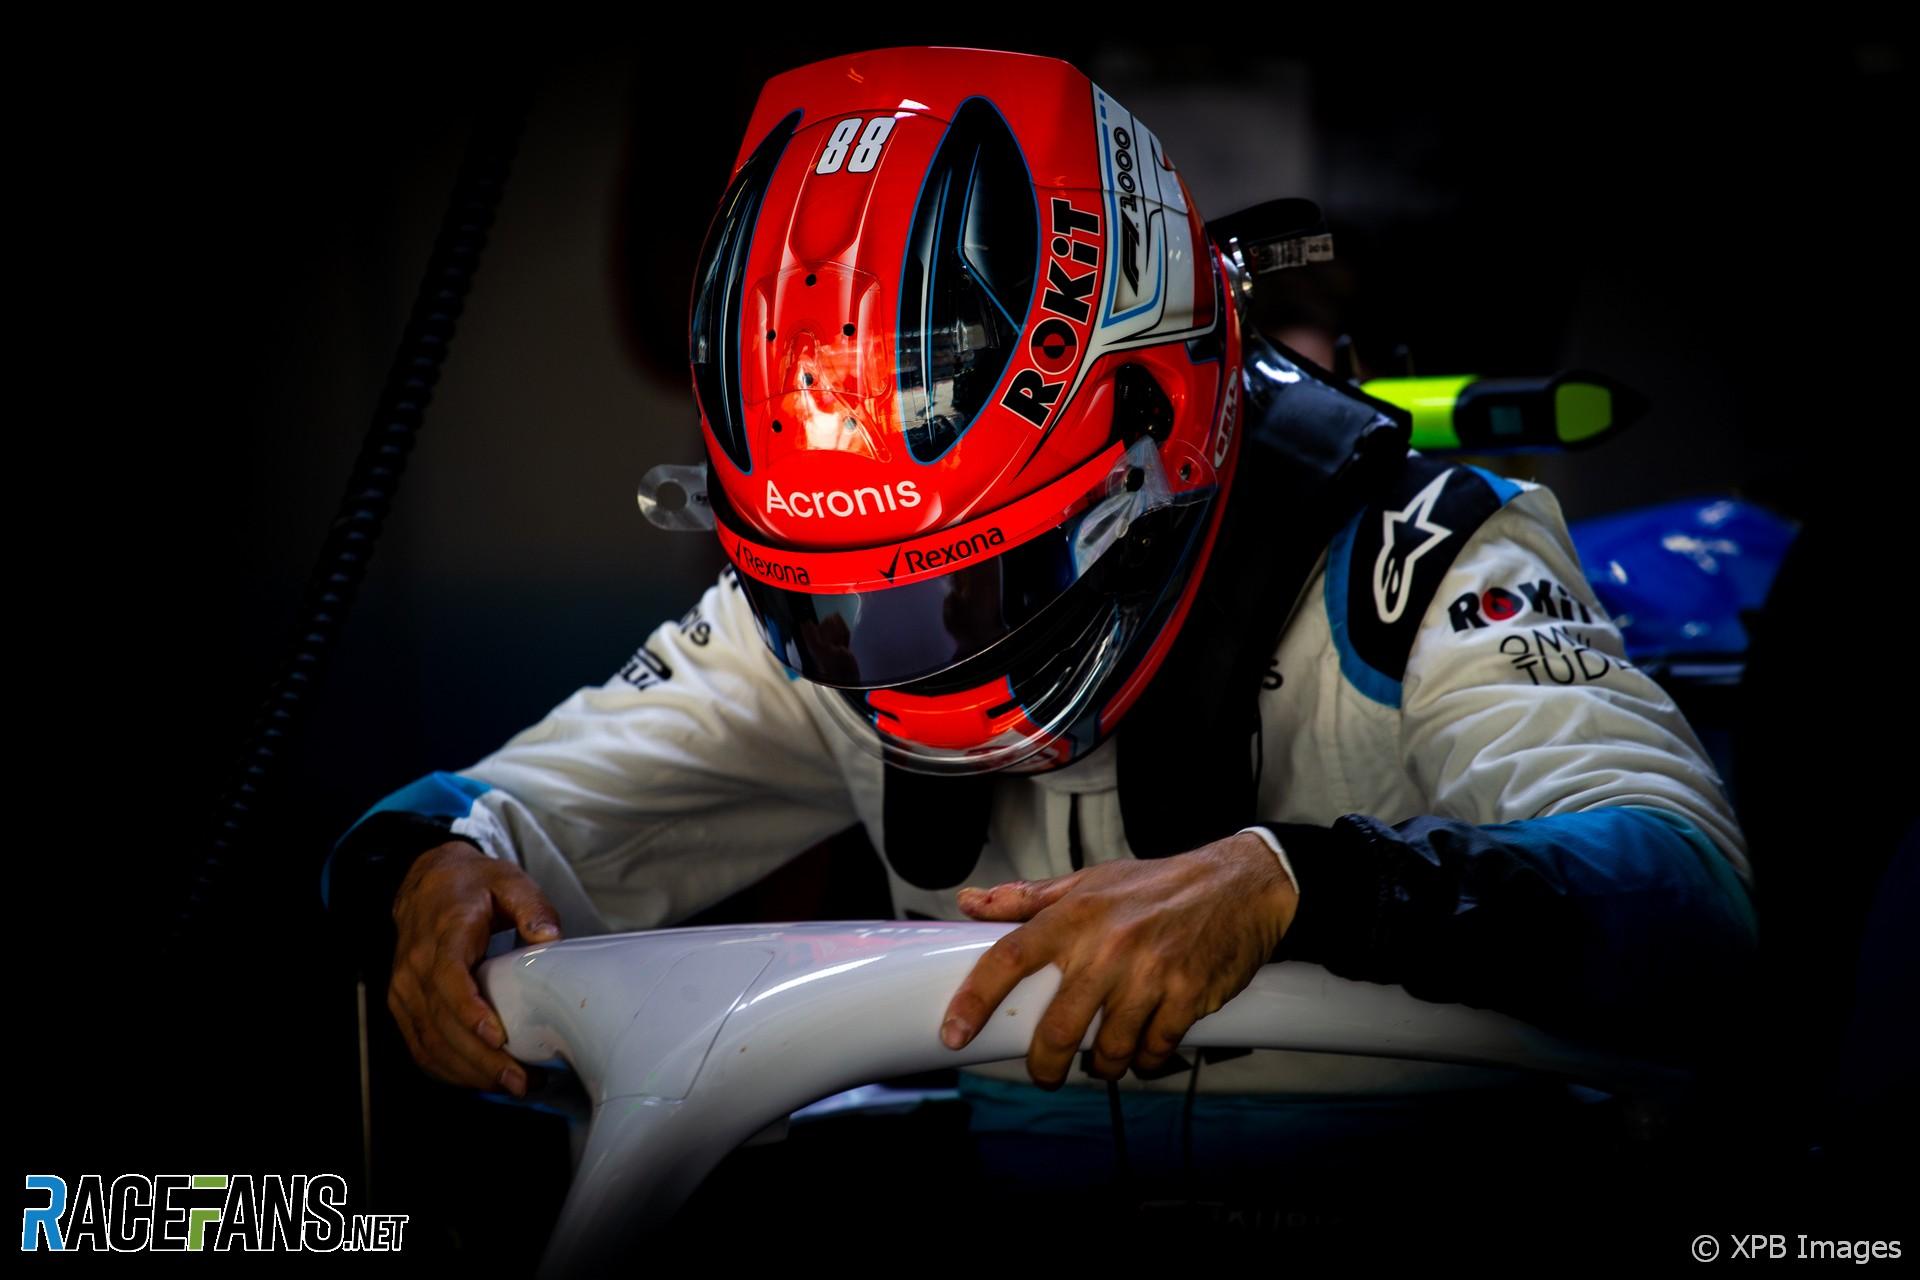 Robert Kubica, Williams, Shanghai International Circuit, 2019